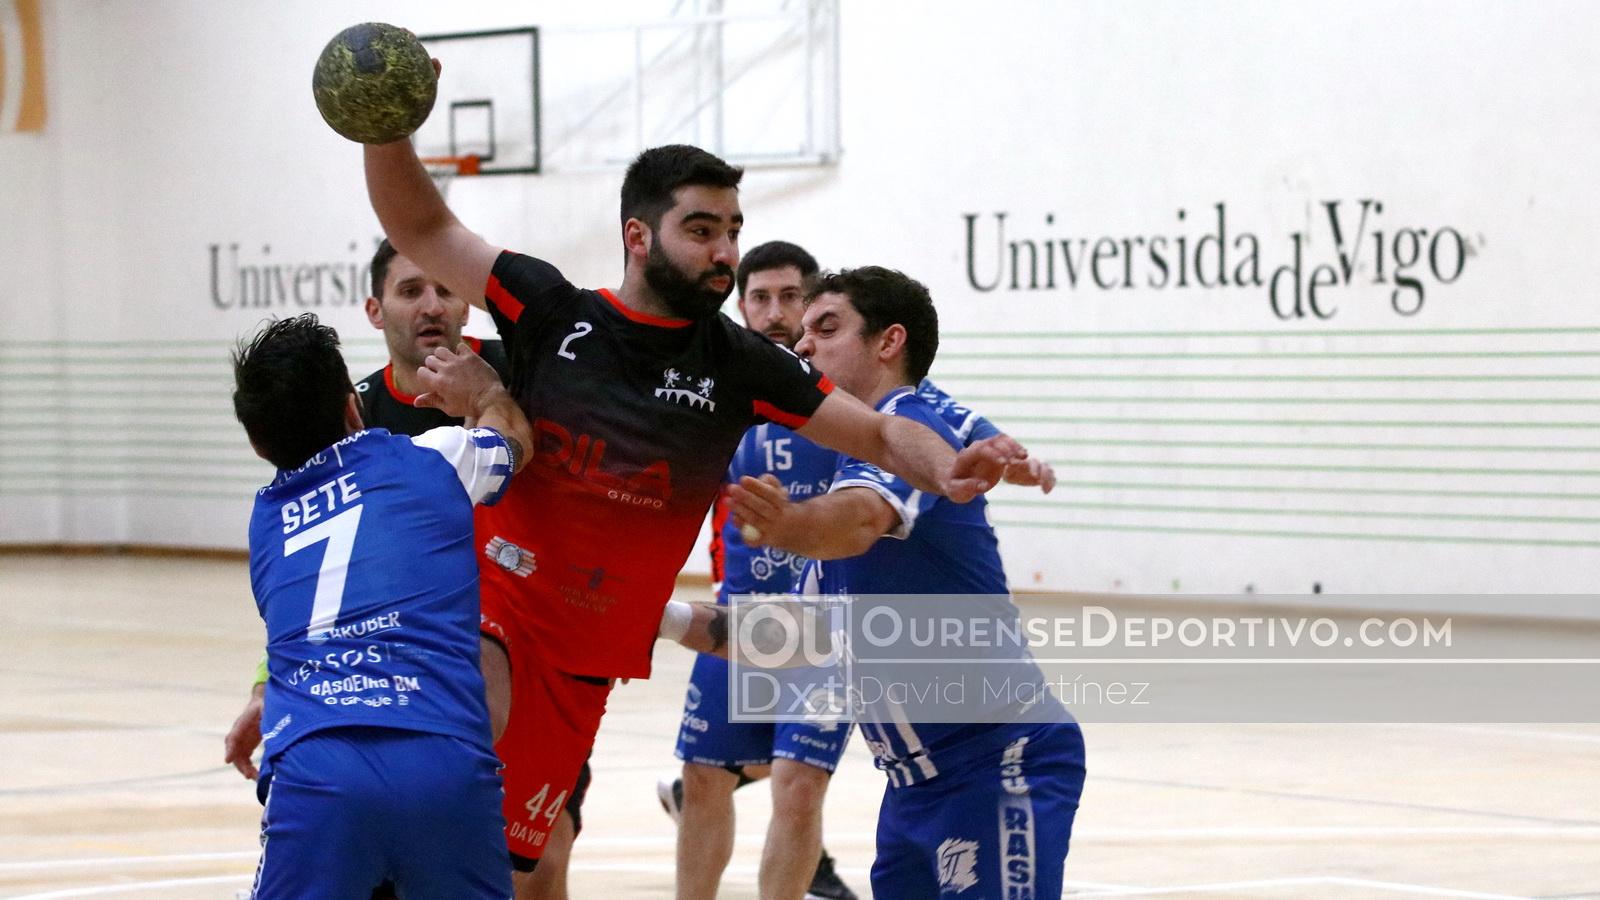 Campus Ourense Rasoeiro Foto David Martinez